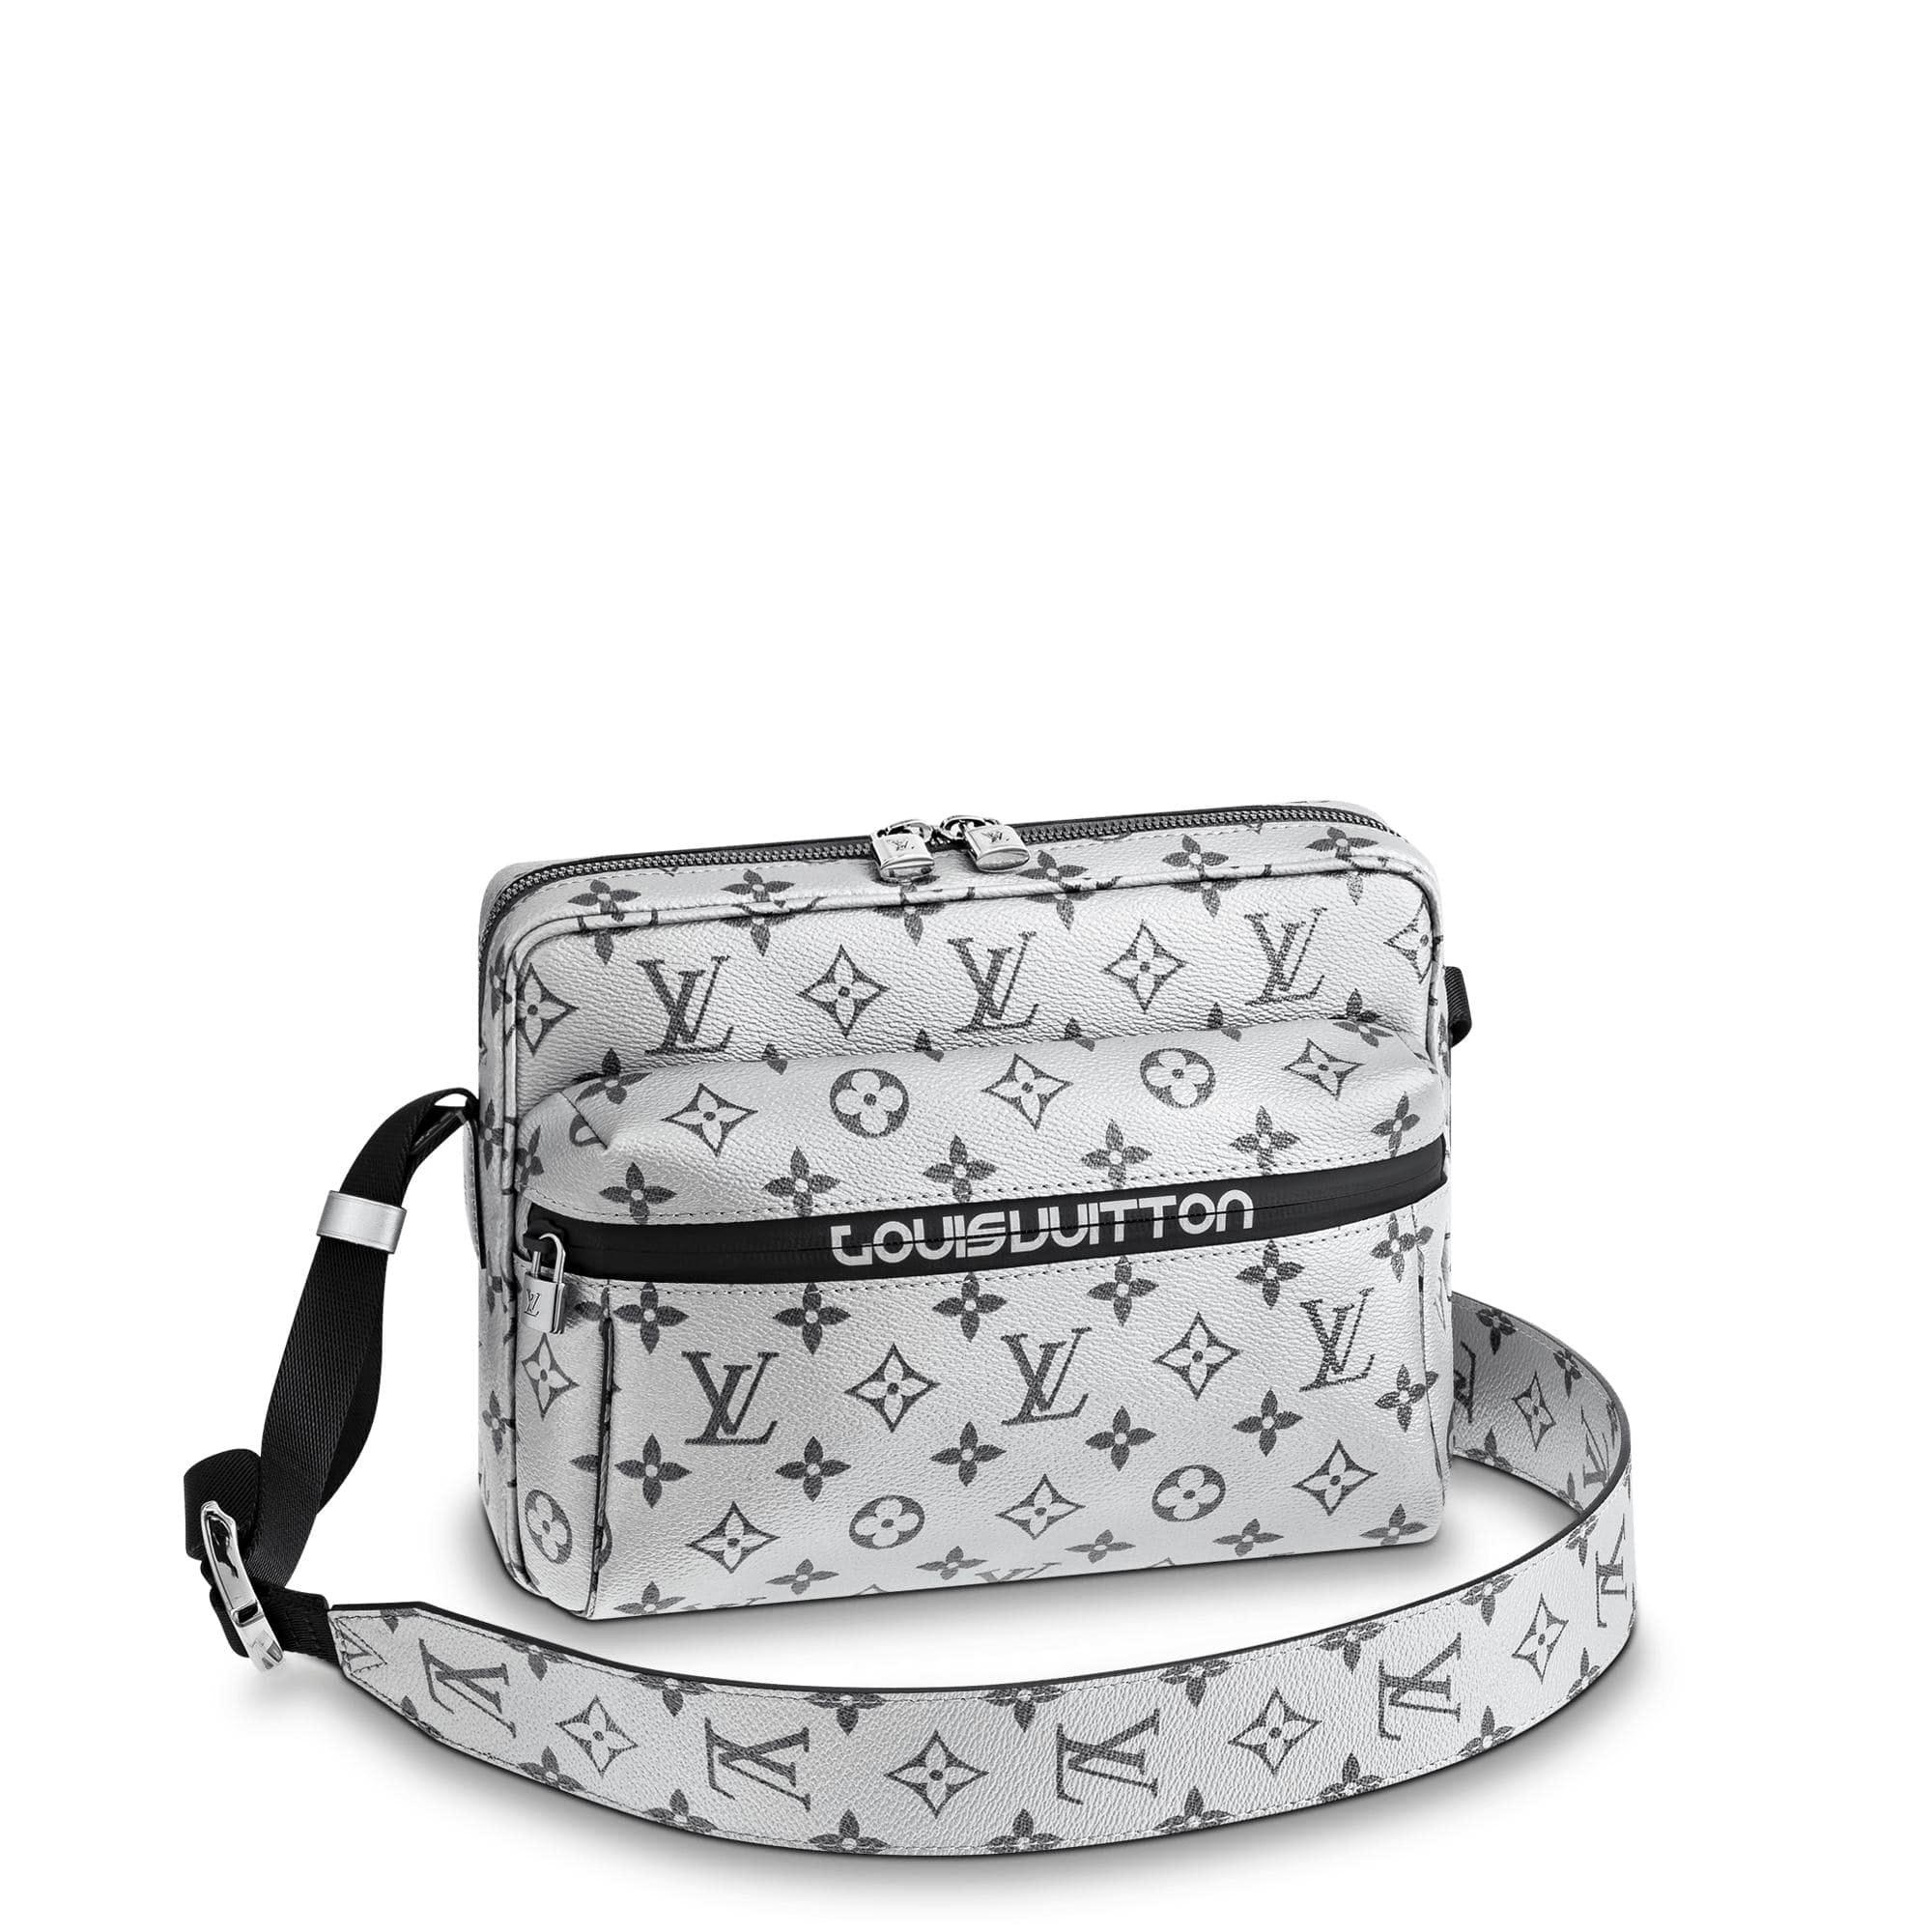 Louis Vuitton Messenger Monogram Outdoor PM White